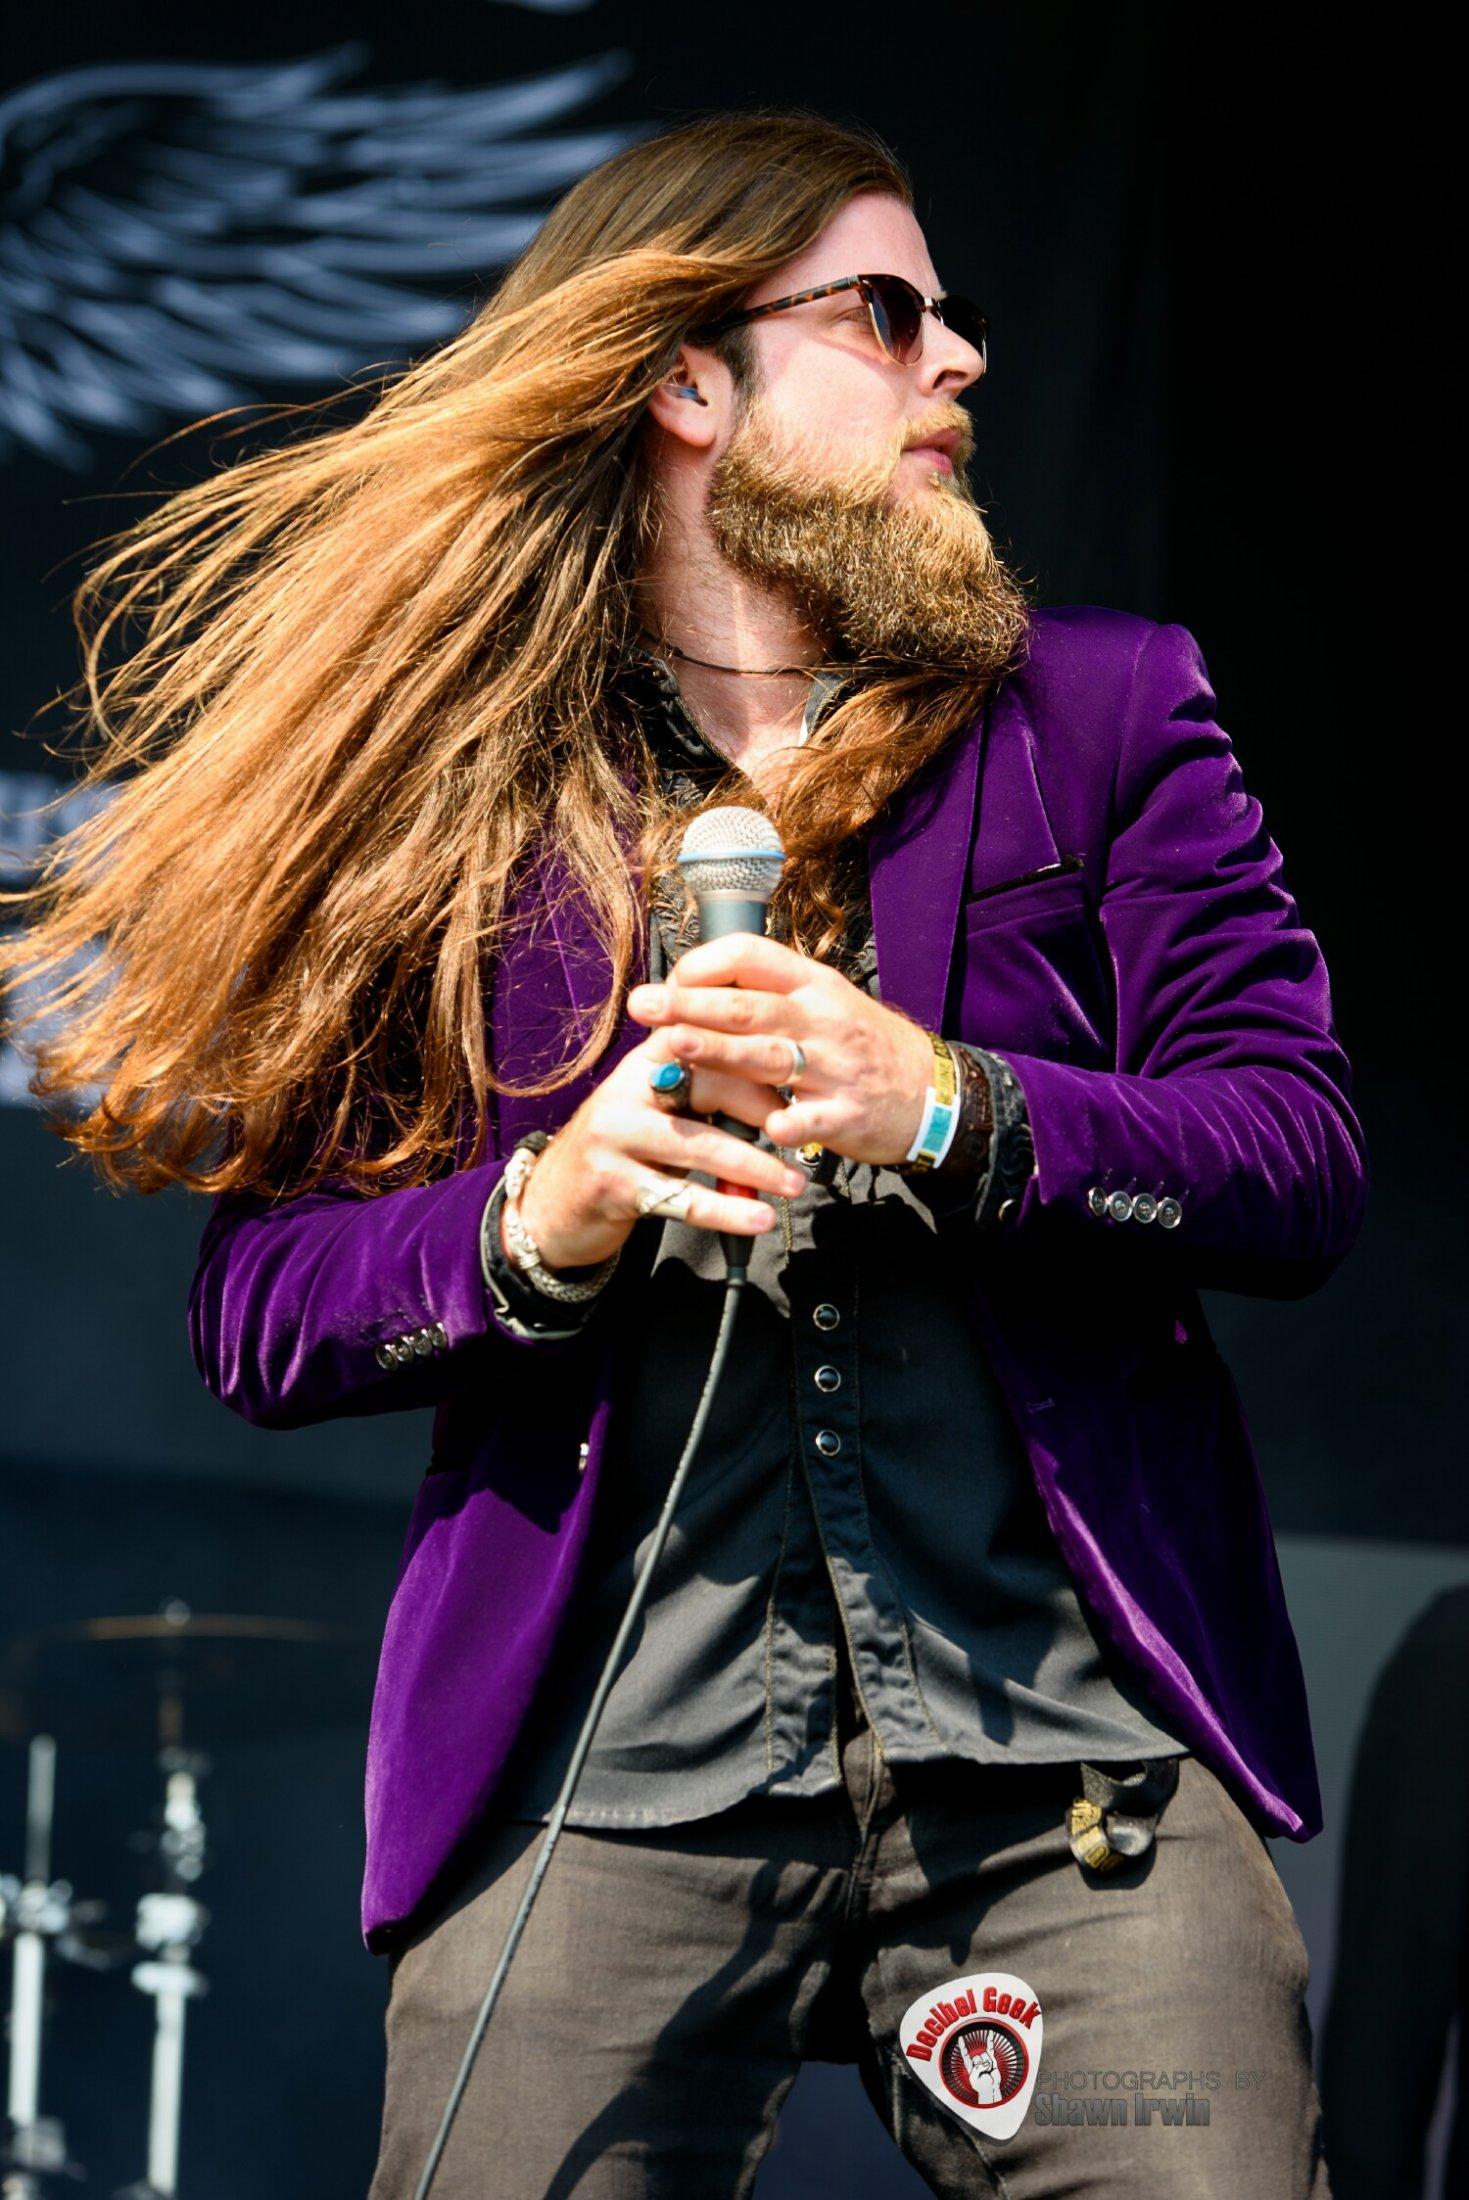 James Holkworth The Coolbenders #8-Sweden Rock 2019-Shawn Irwin